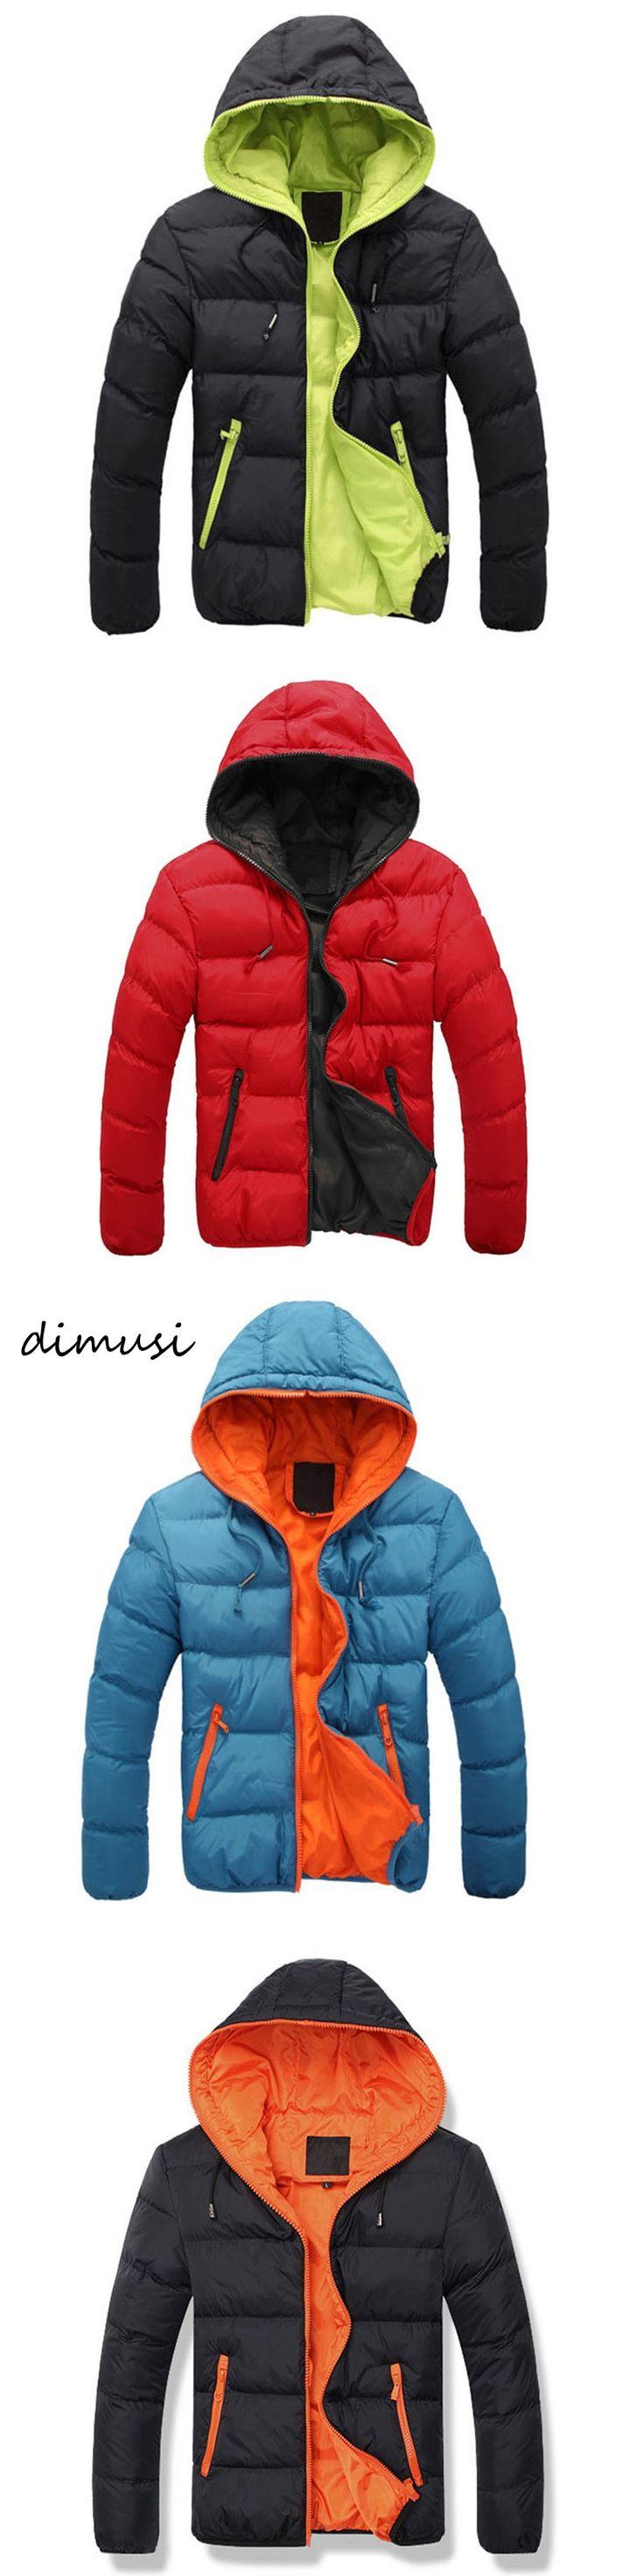 DIMUS 2017 Winter Jacket Men's Warm Coat Jacket mens Parkas Jackets Men's coat Zipper Stand collar jacket men Size 4XL PA059